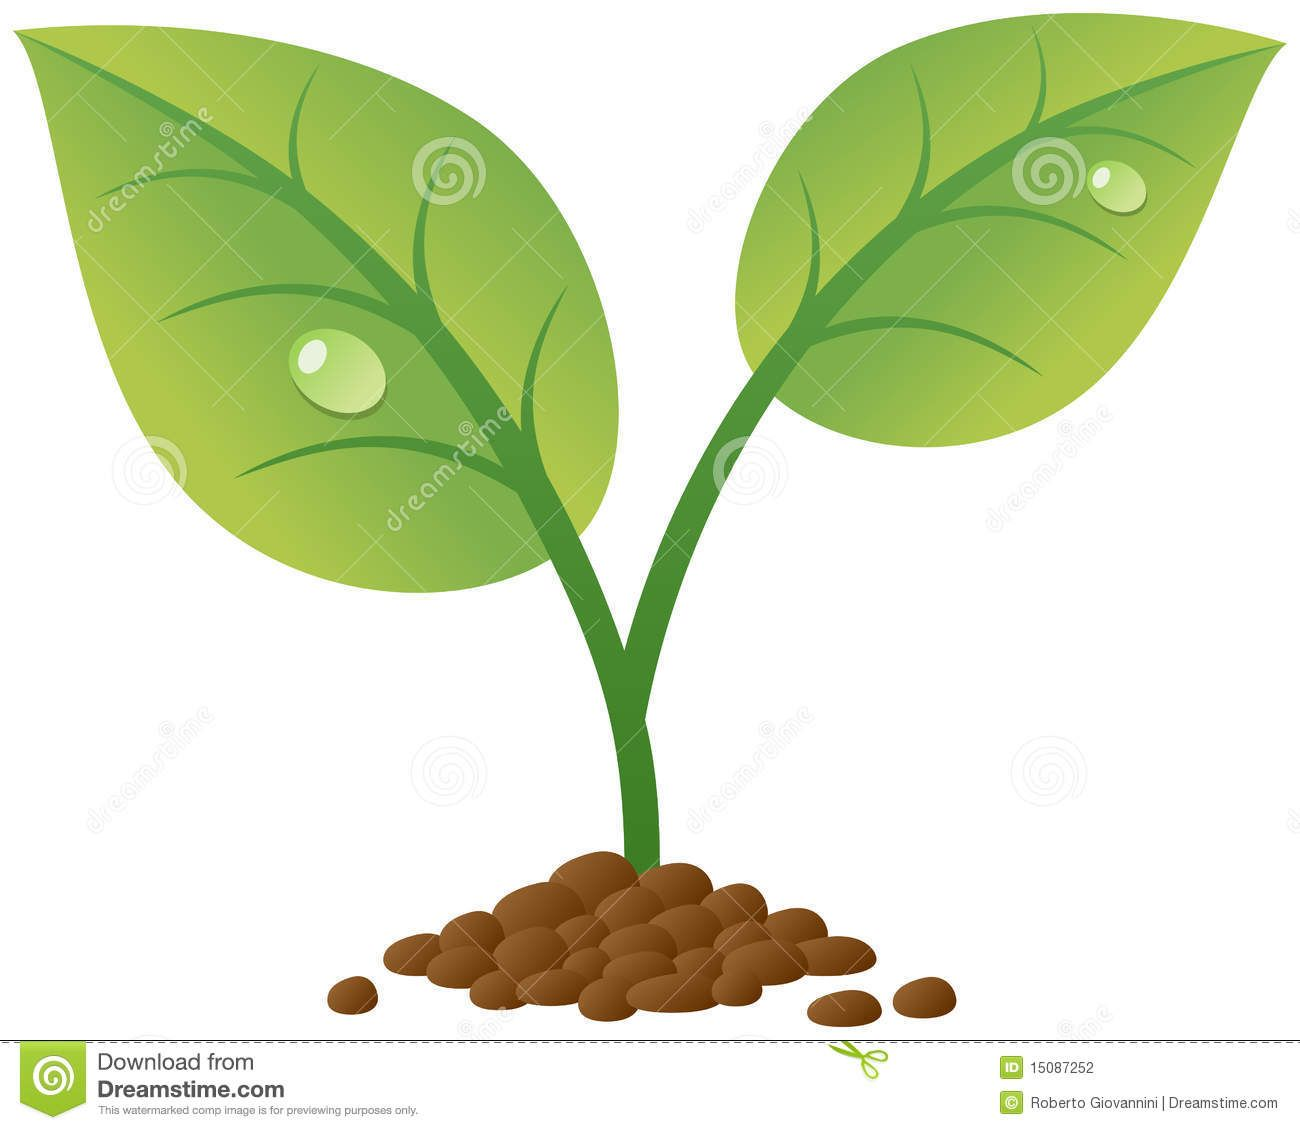 svg transparent download Sprout clipart. Plant kid plants leaves